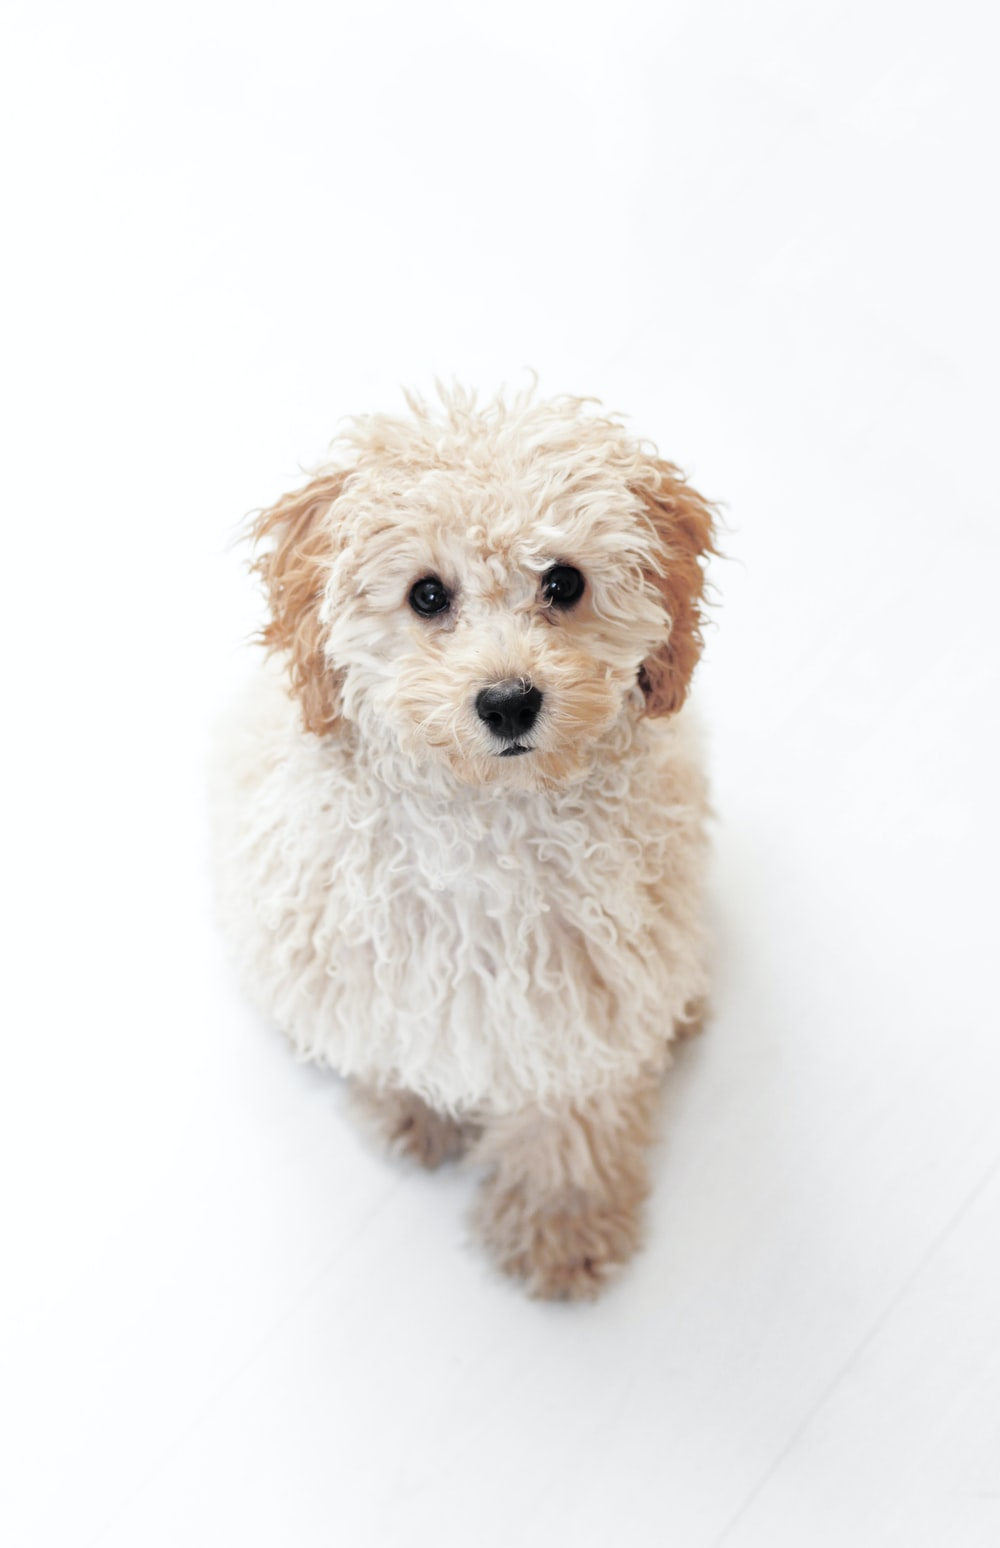 beige coated dog